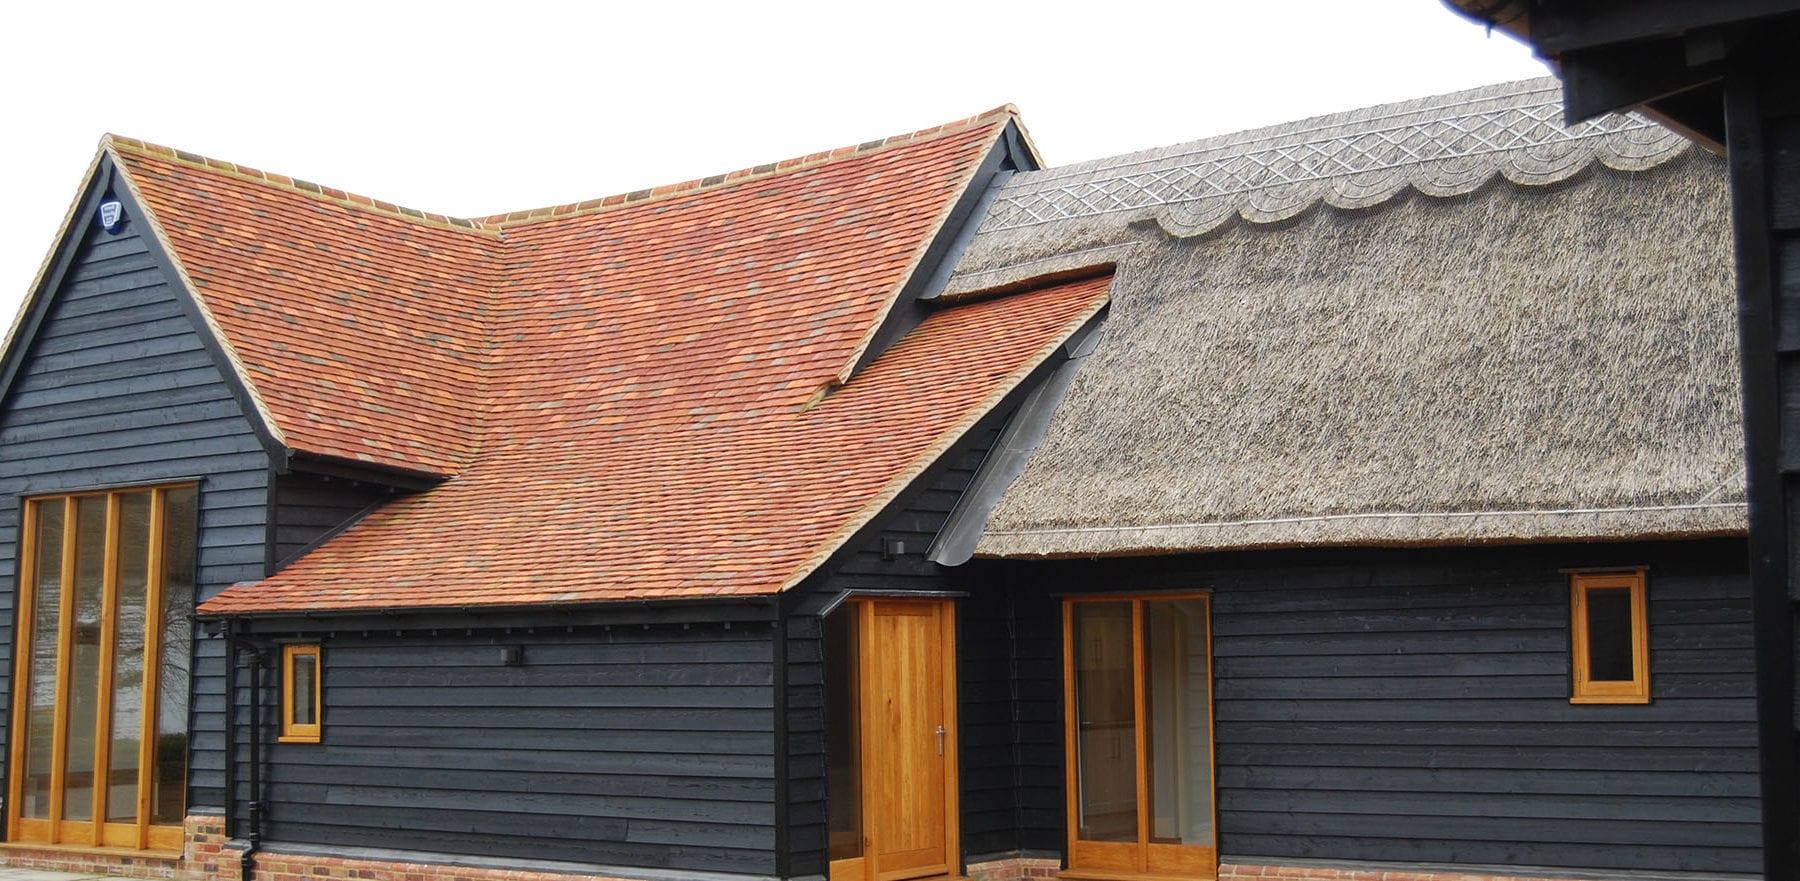 Lifestiles - Handmade Multi Clay Roof Tiles - Ford End, England 2